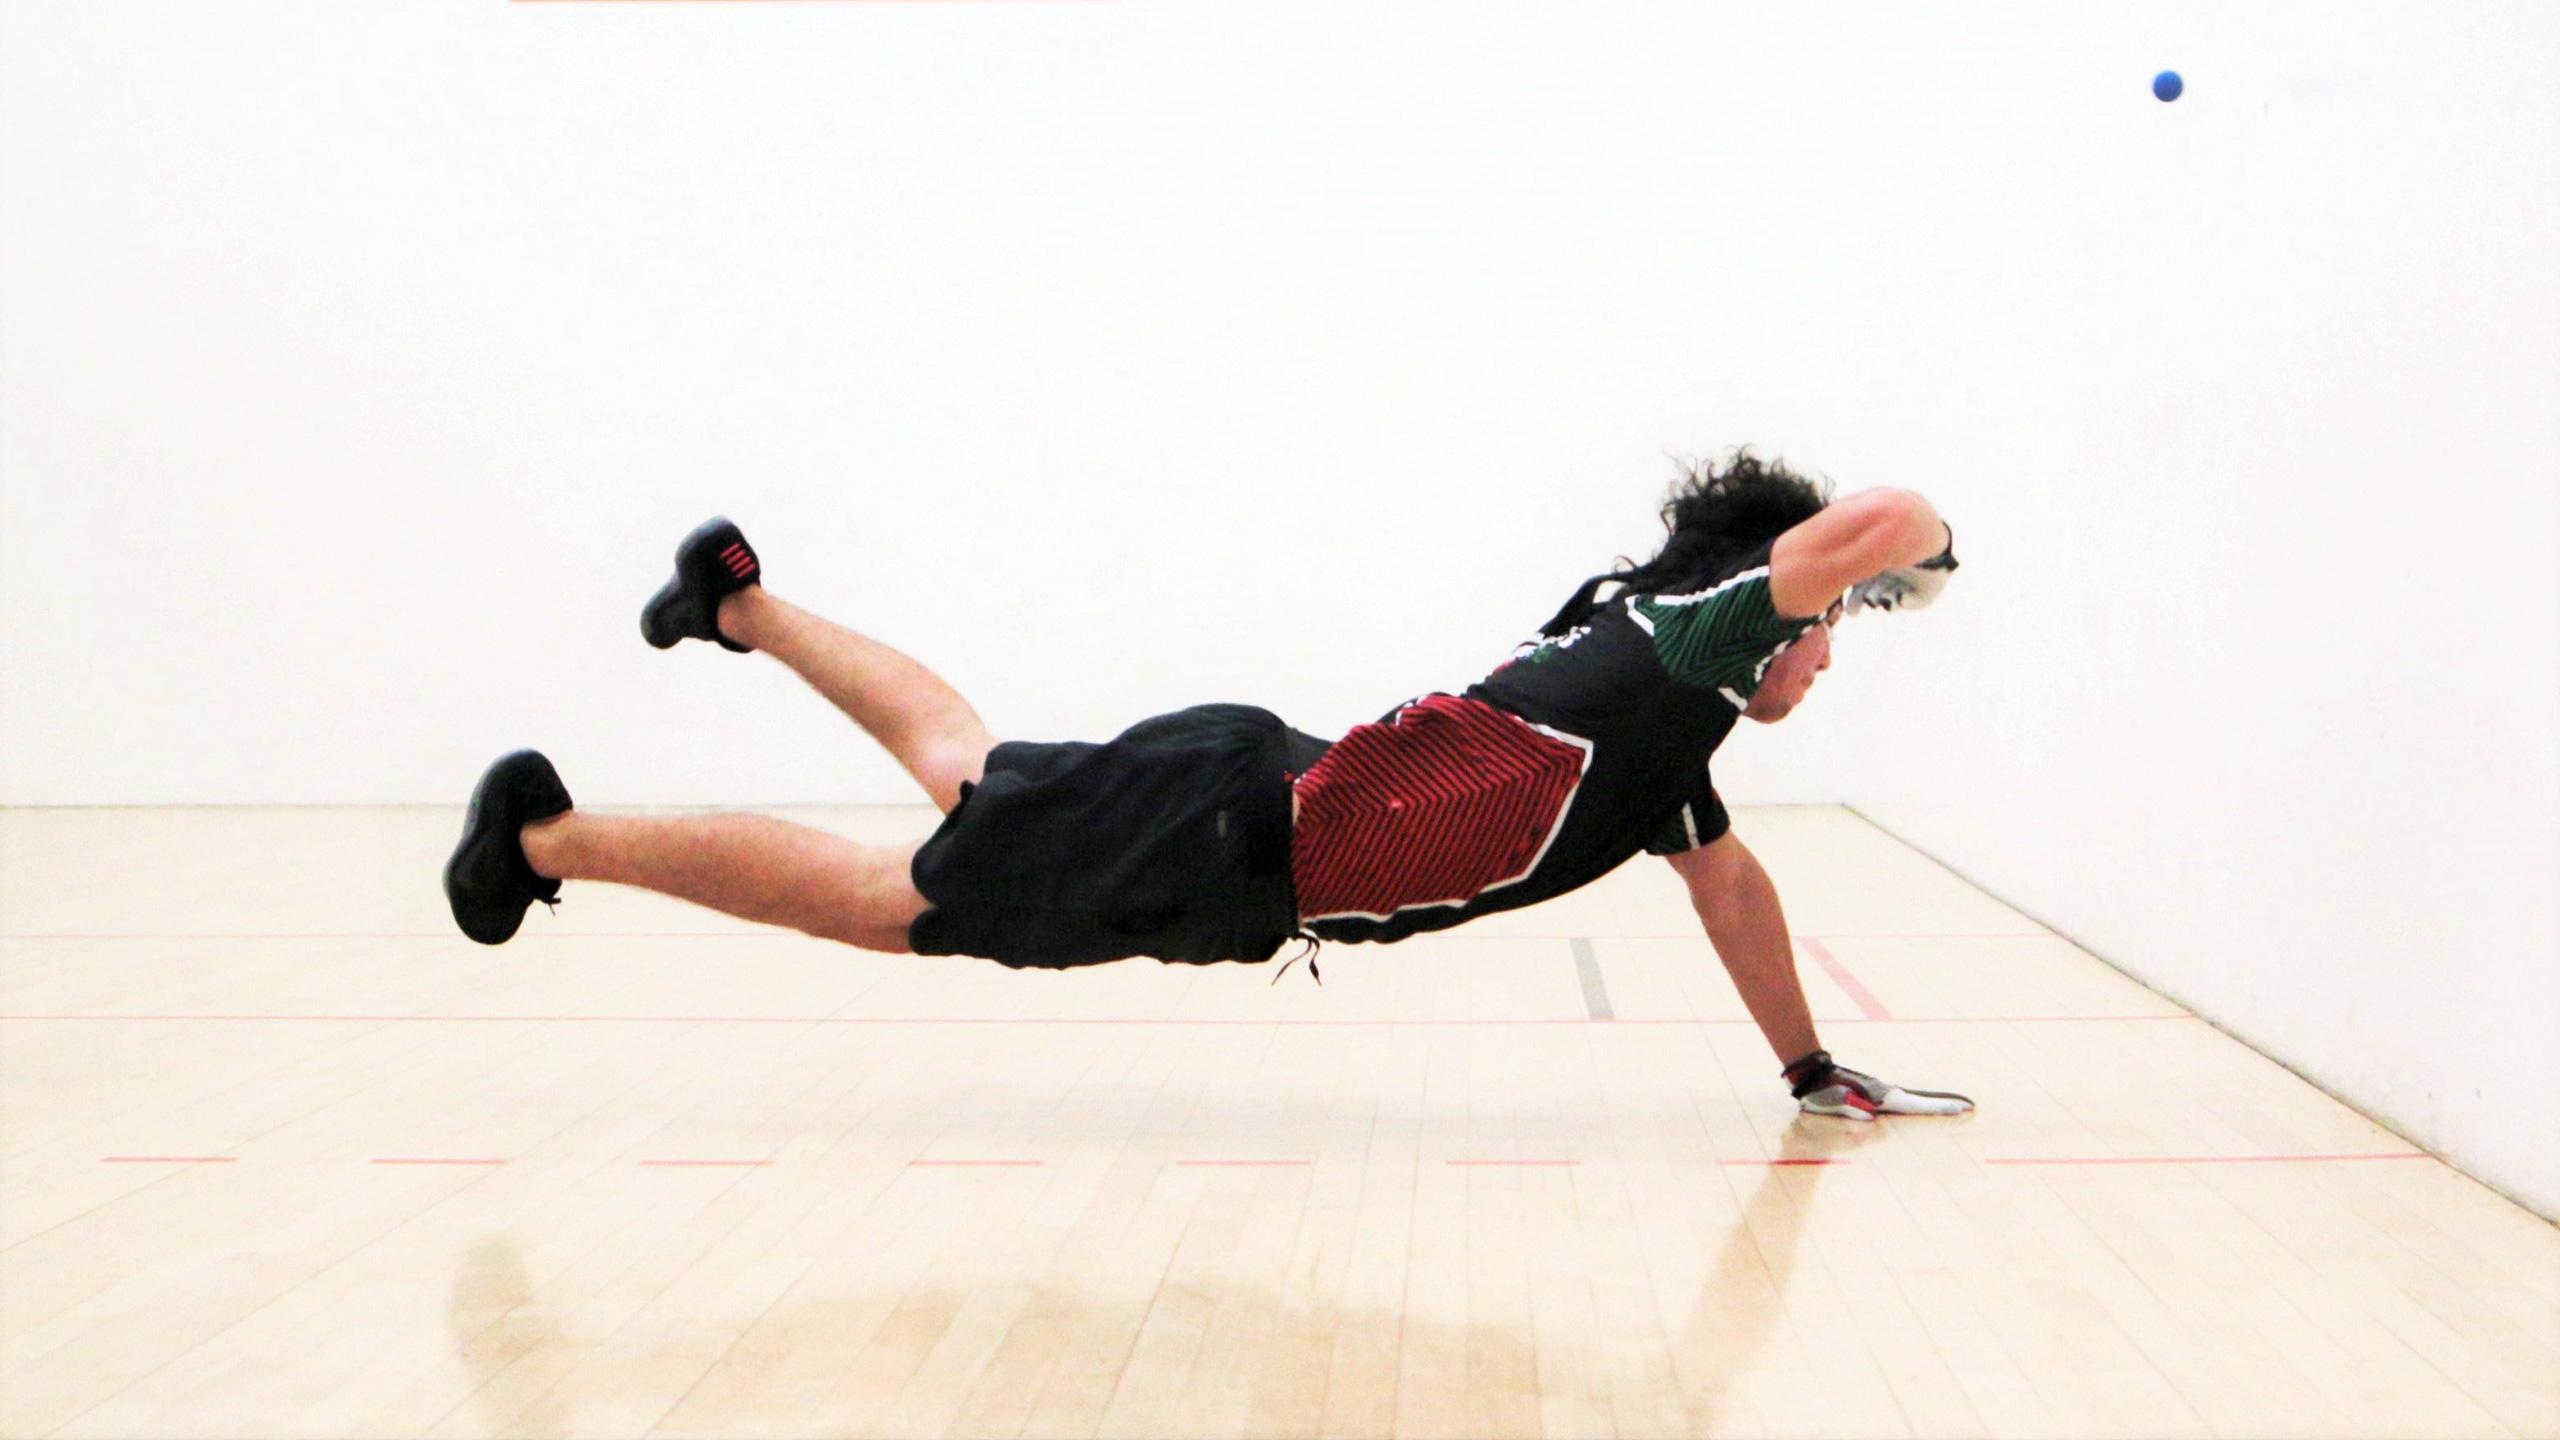 Handball Memorial Open & WPH Race for Eight Pro Tour Stop #2